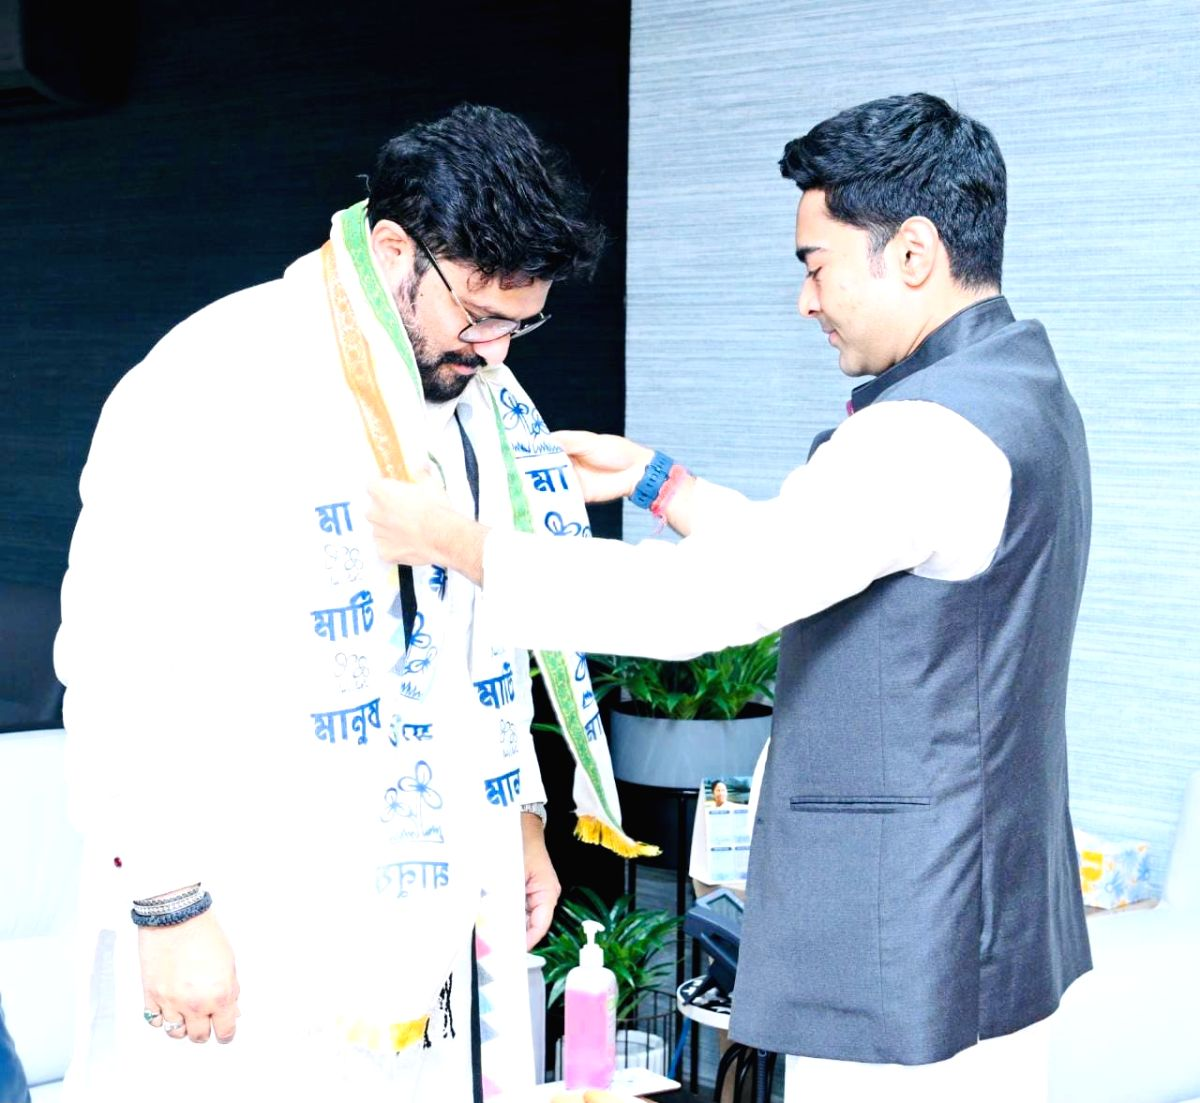 Kolkata : Former Union Minister and sitting MP Babul Supriyo joined the Trinamool family today in the presence of National General Secretary Abhishek Banerjee and Rajya Sabha MP Derek O'Brien in Kolkata on September 18, 2021. (photo:All India Trinamo